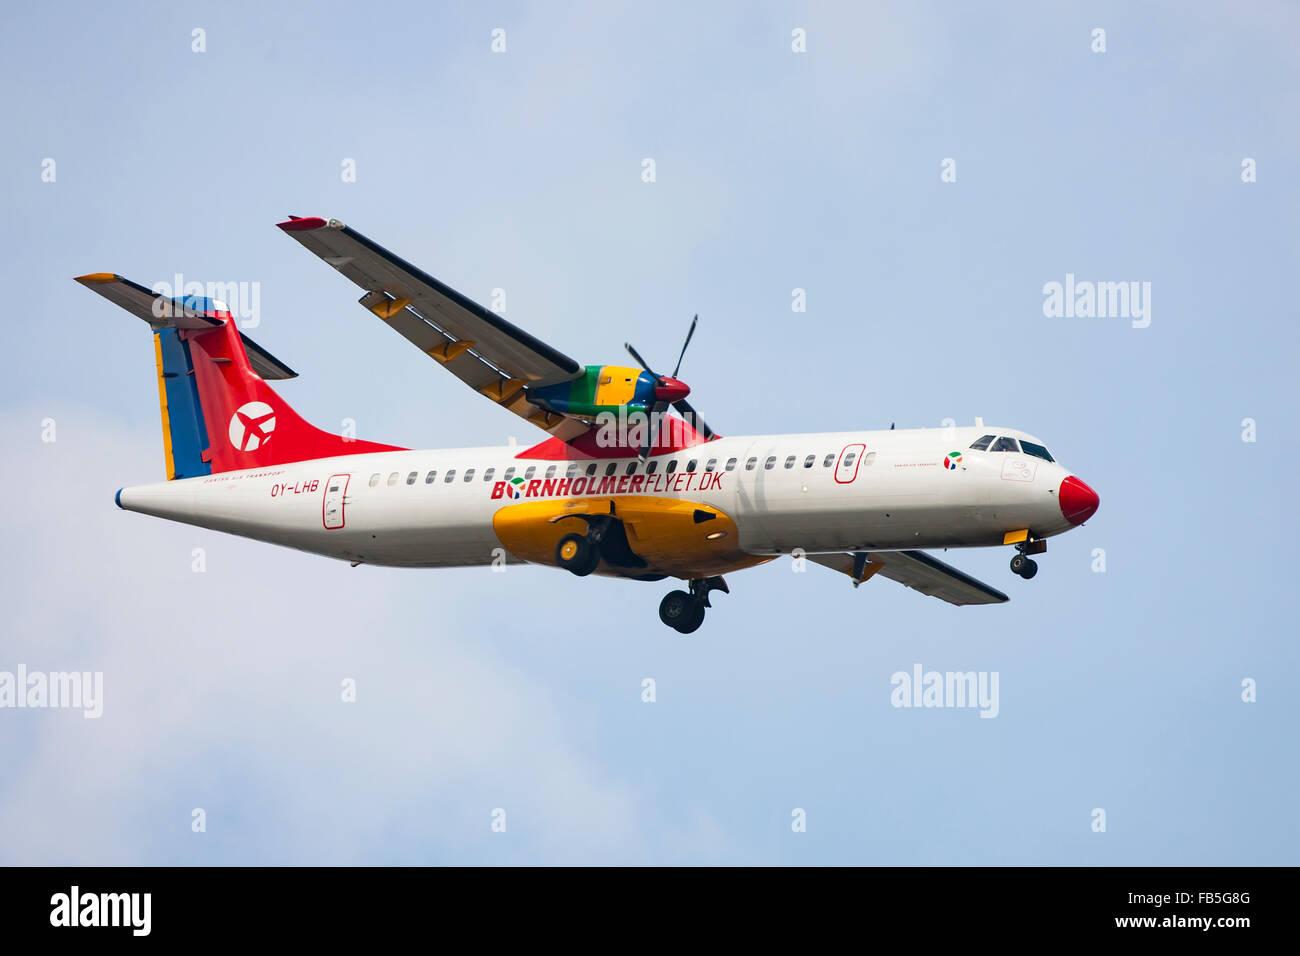 Bornholmerflyet Airliner - Stock Image